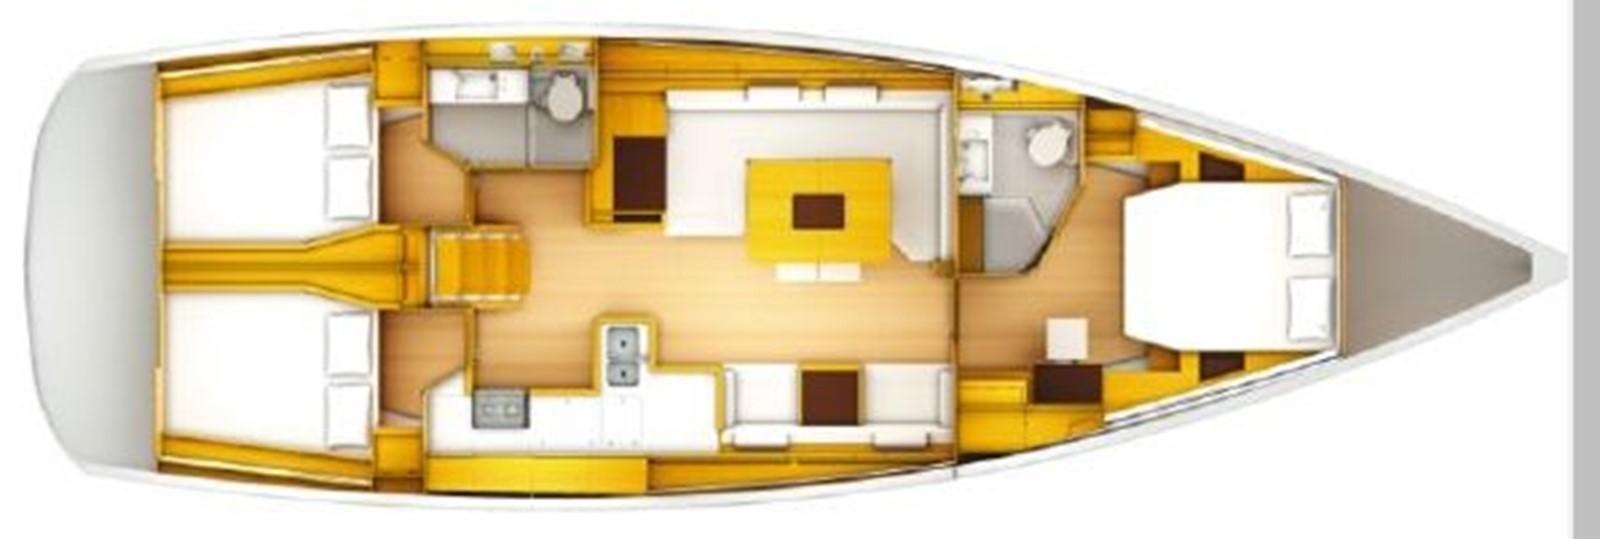 2019 JEANNEAU Sun Odyssey 519 Cruising Sailboat 2606893